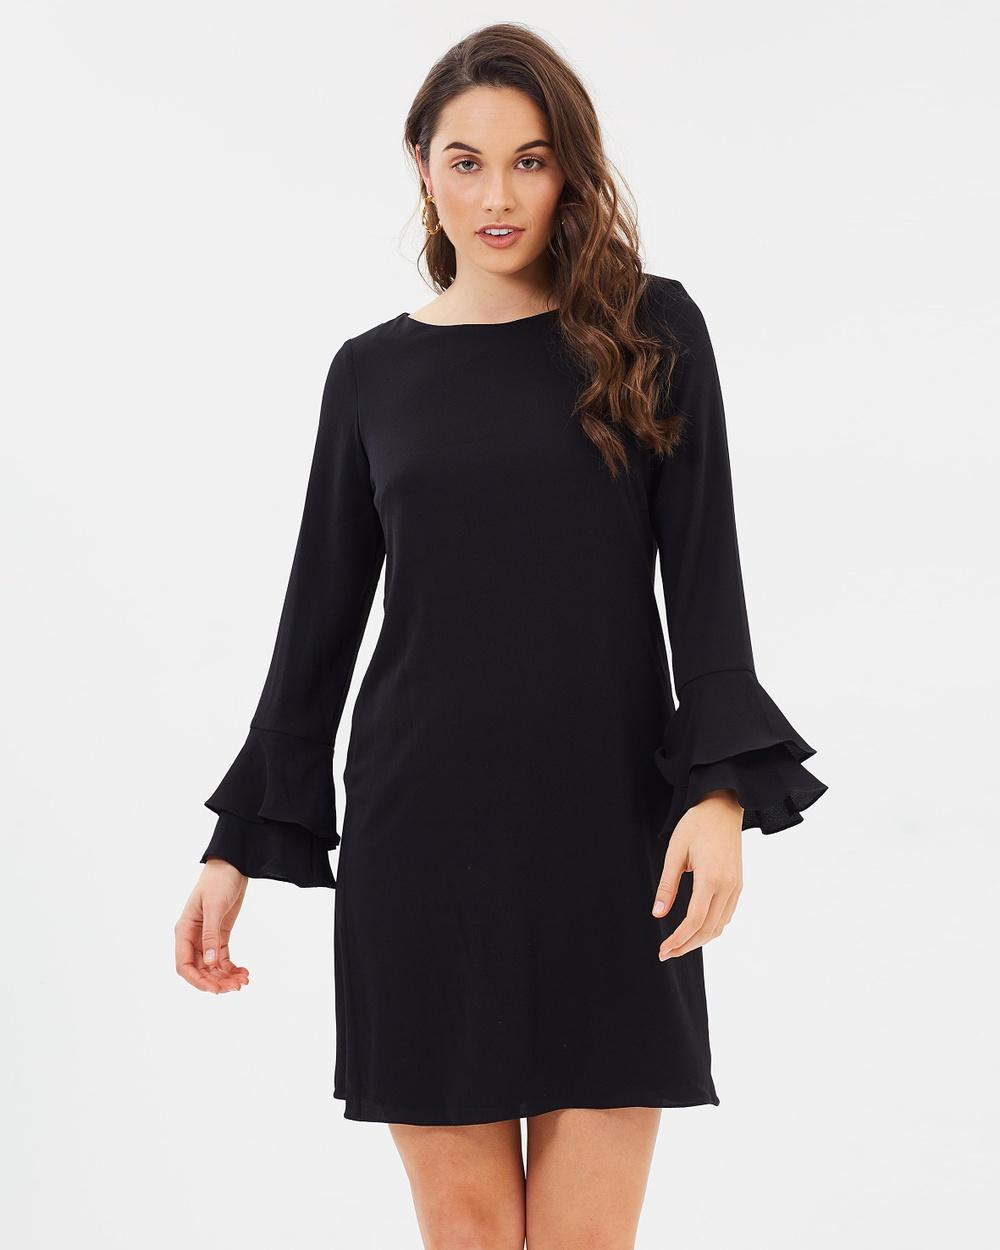 Wallis Double Fluted Sleeve Dress Dresses Black Double Fluted Sleeve Dress